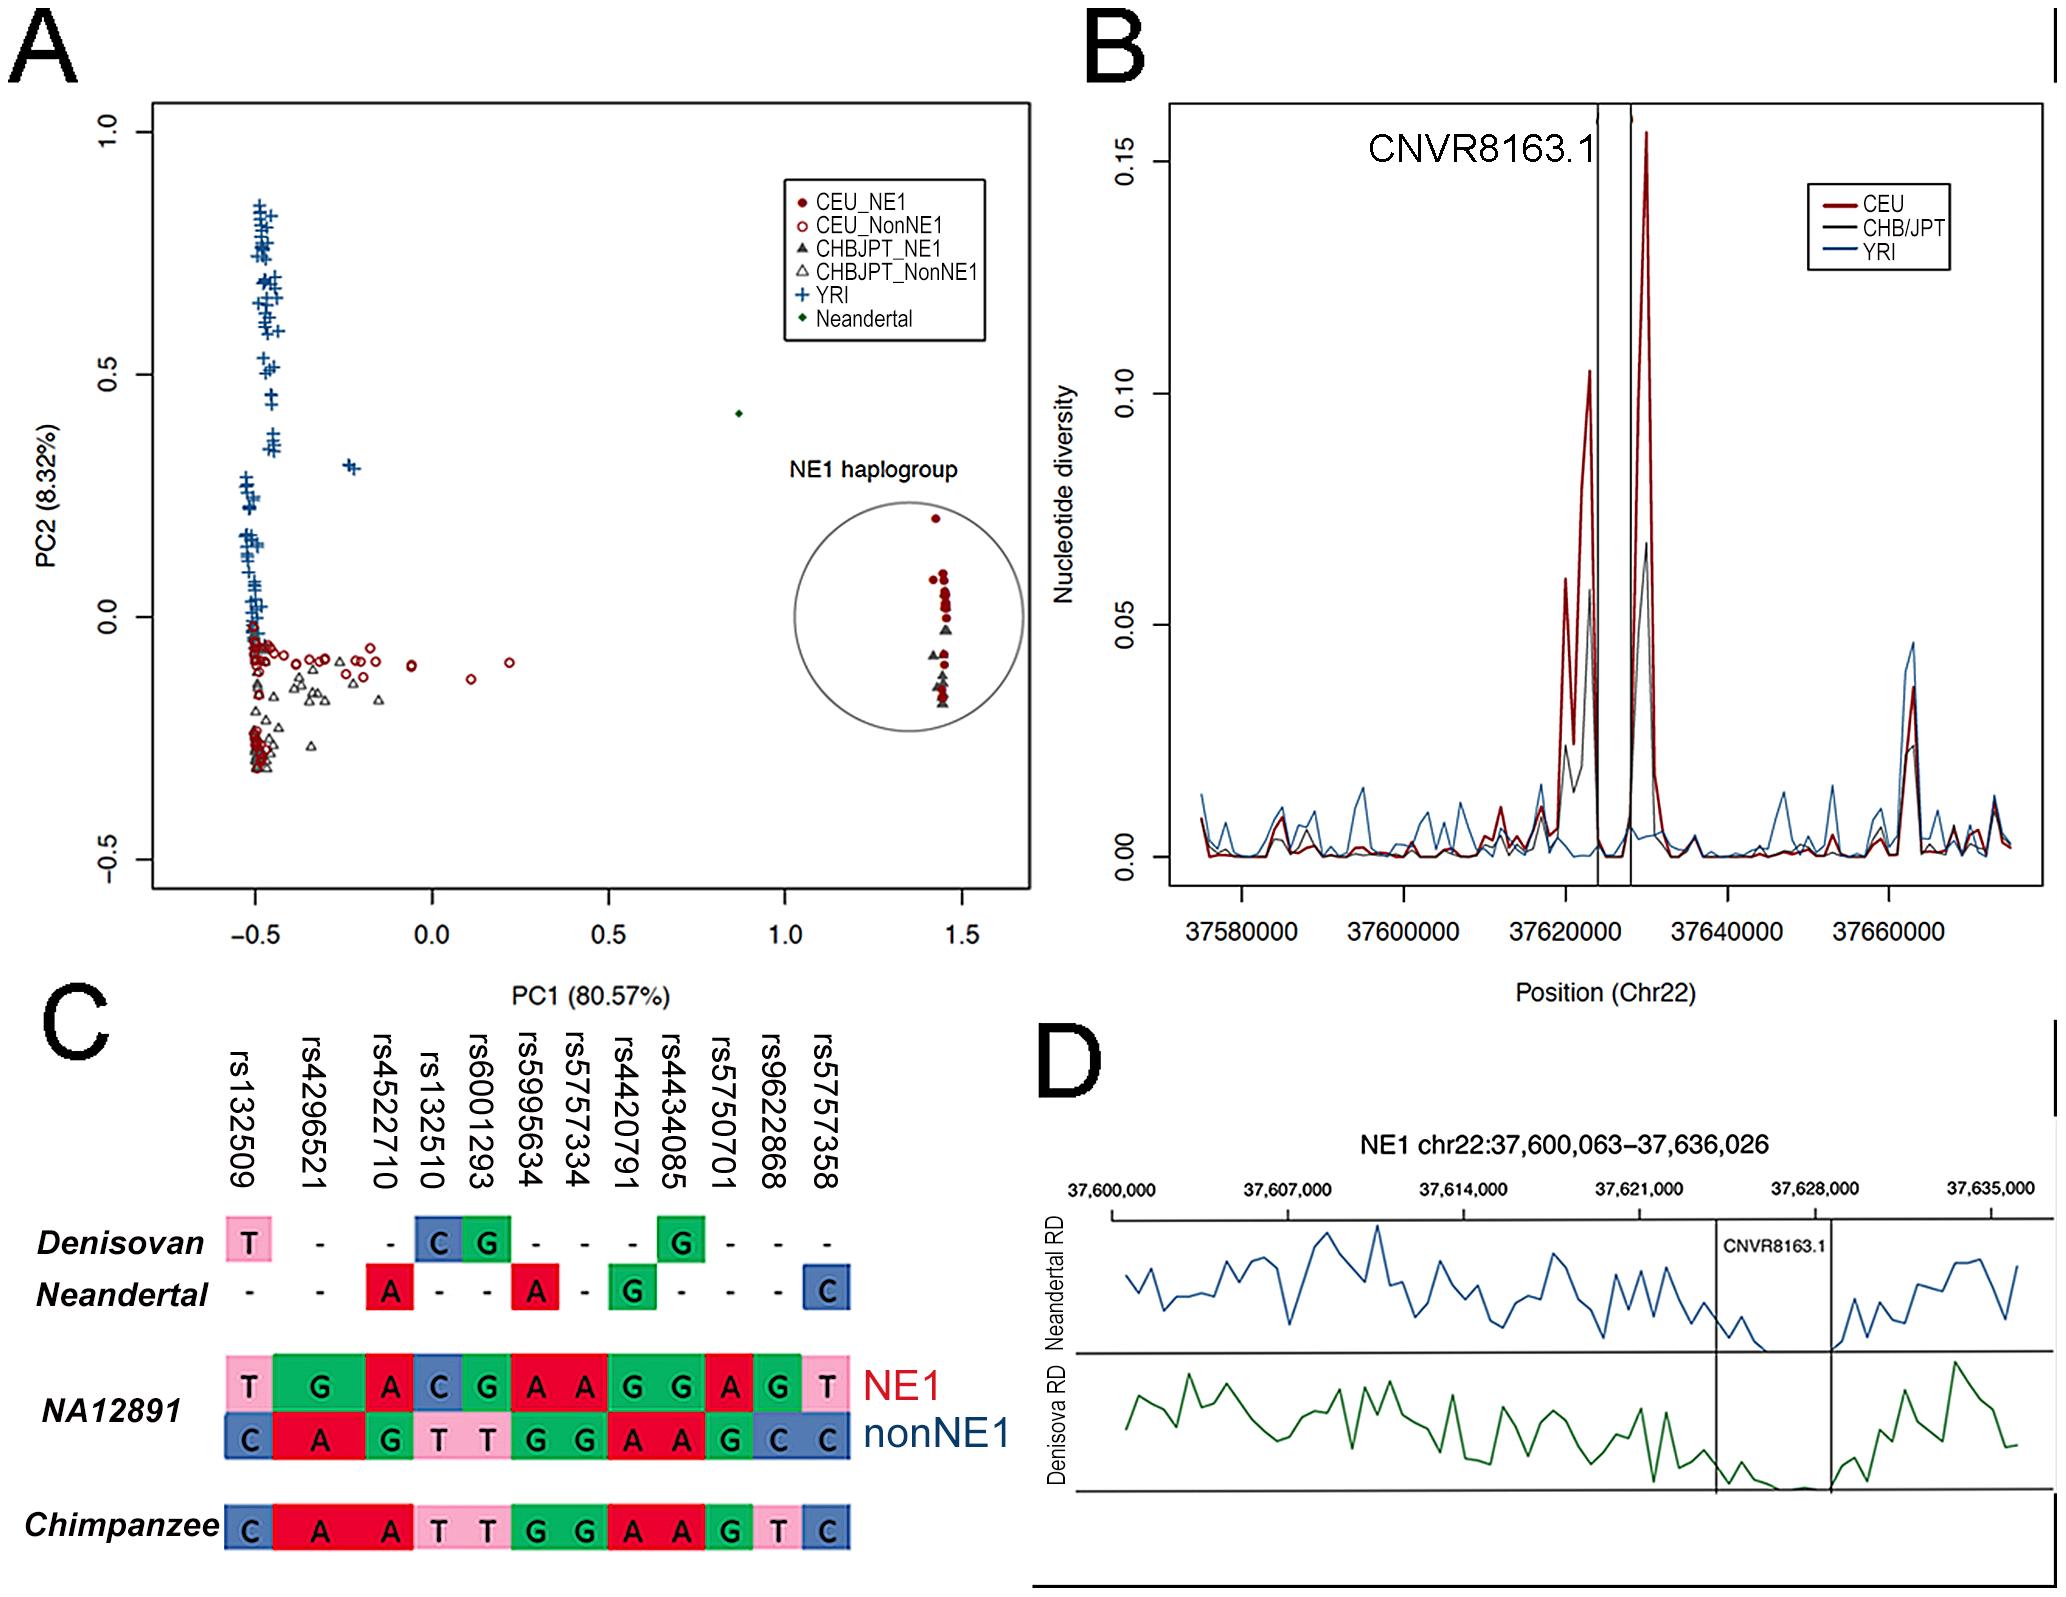 NE1 haplotypes share ancestry with Neandertals.